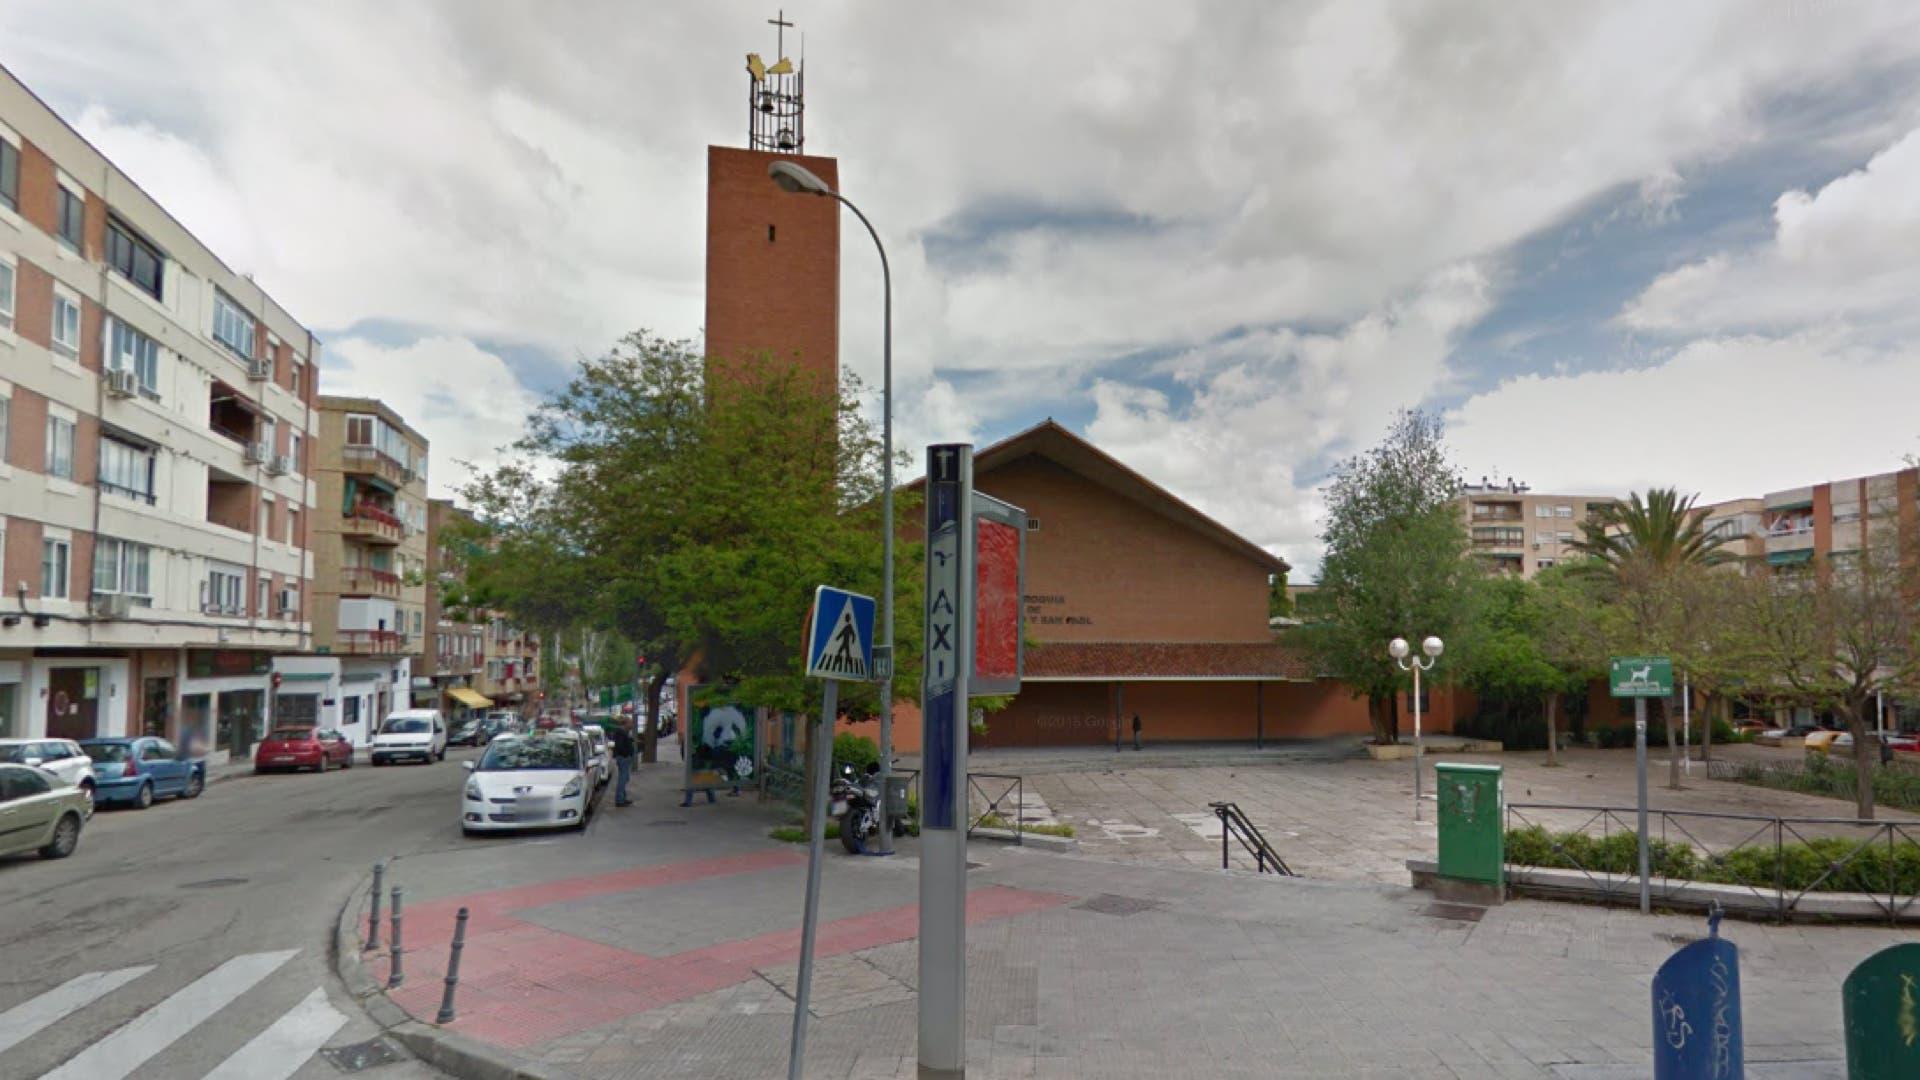 Iglesia de San Pedro y San Pablo en pleno centro de Coslada (Google Maps).